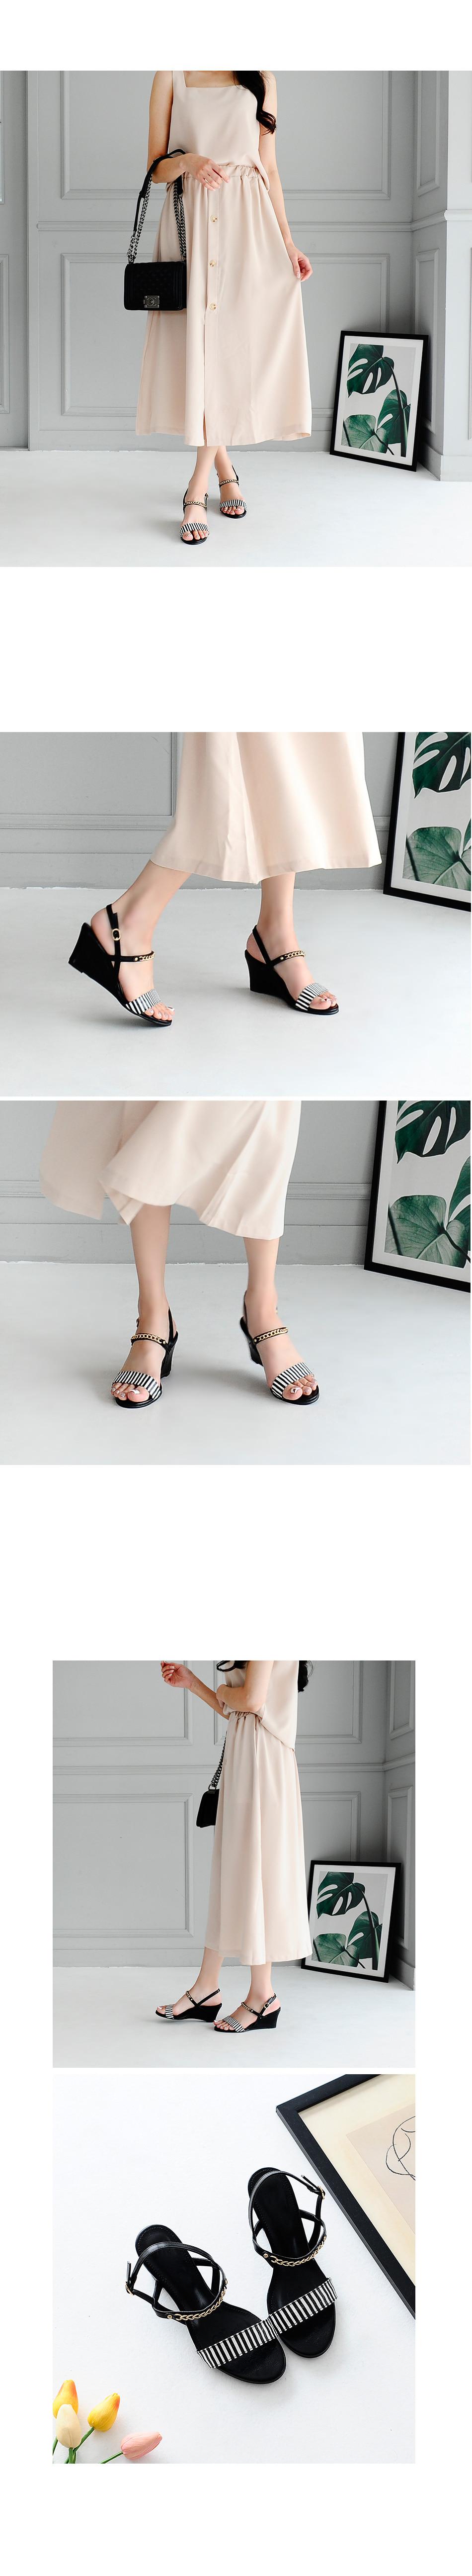 Beelton Wedge Slingback Sandals 7cm